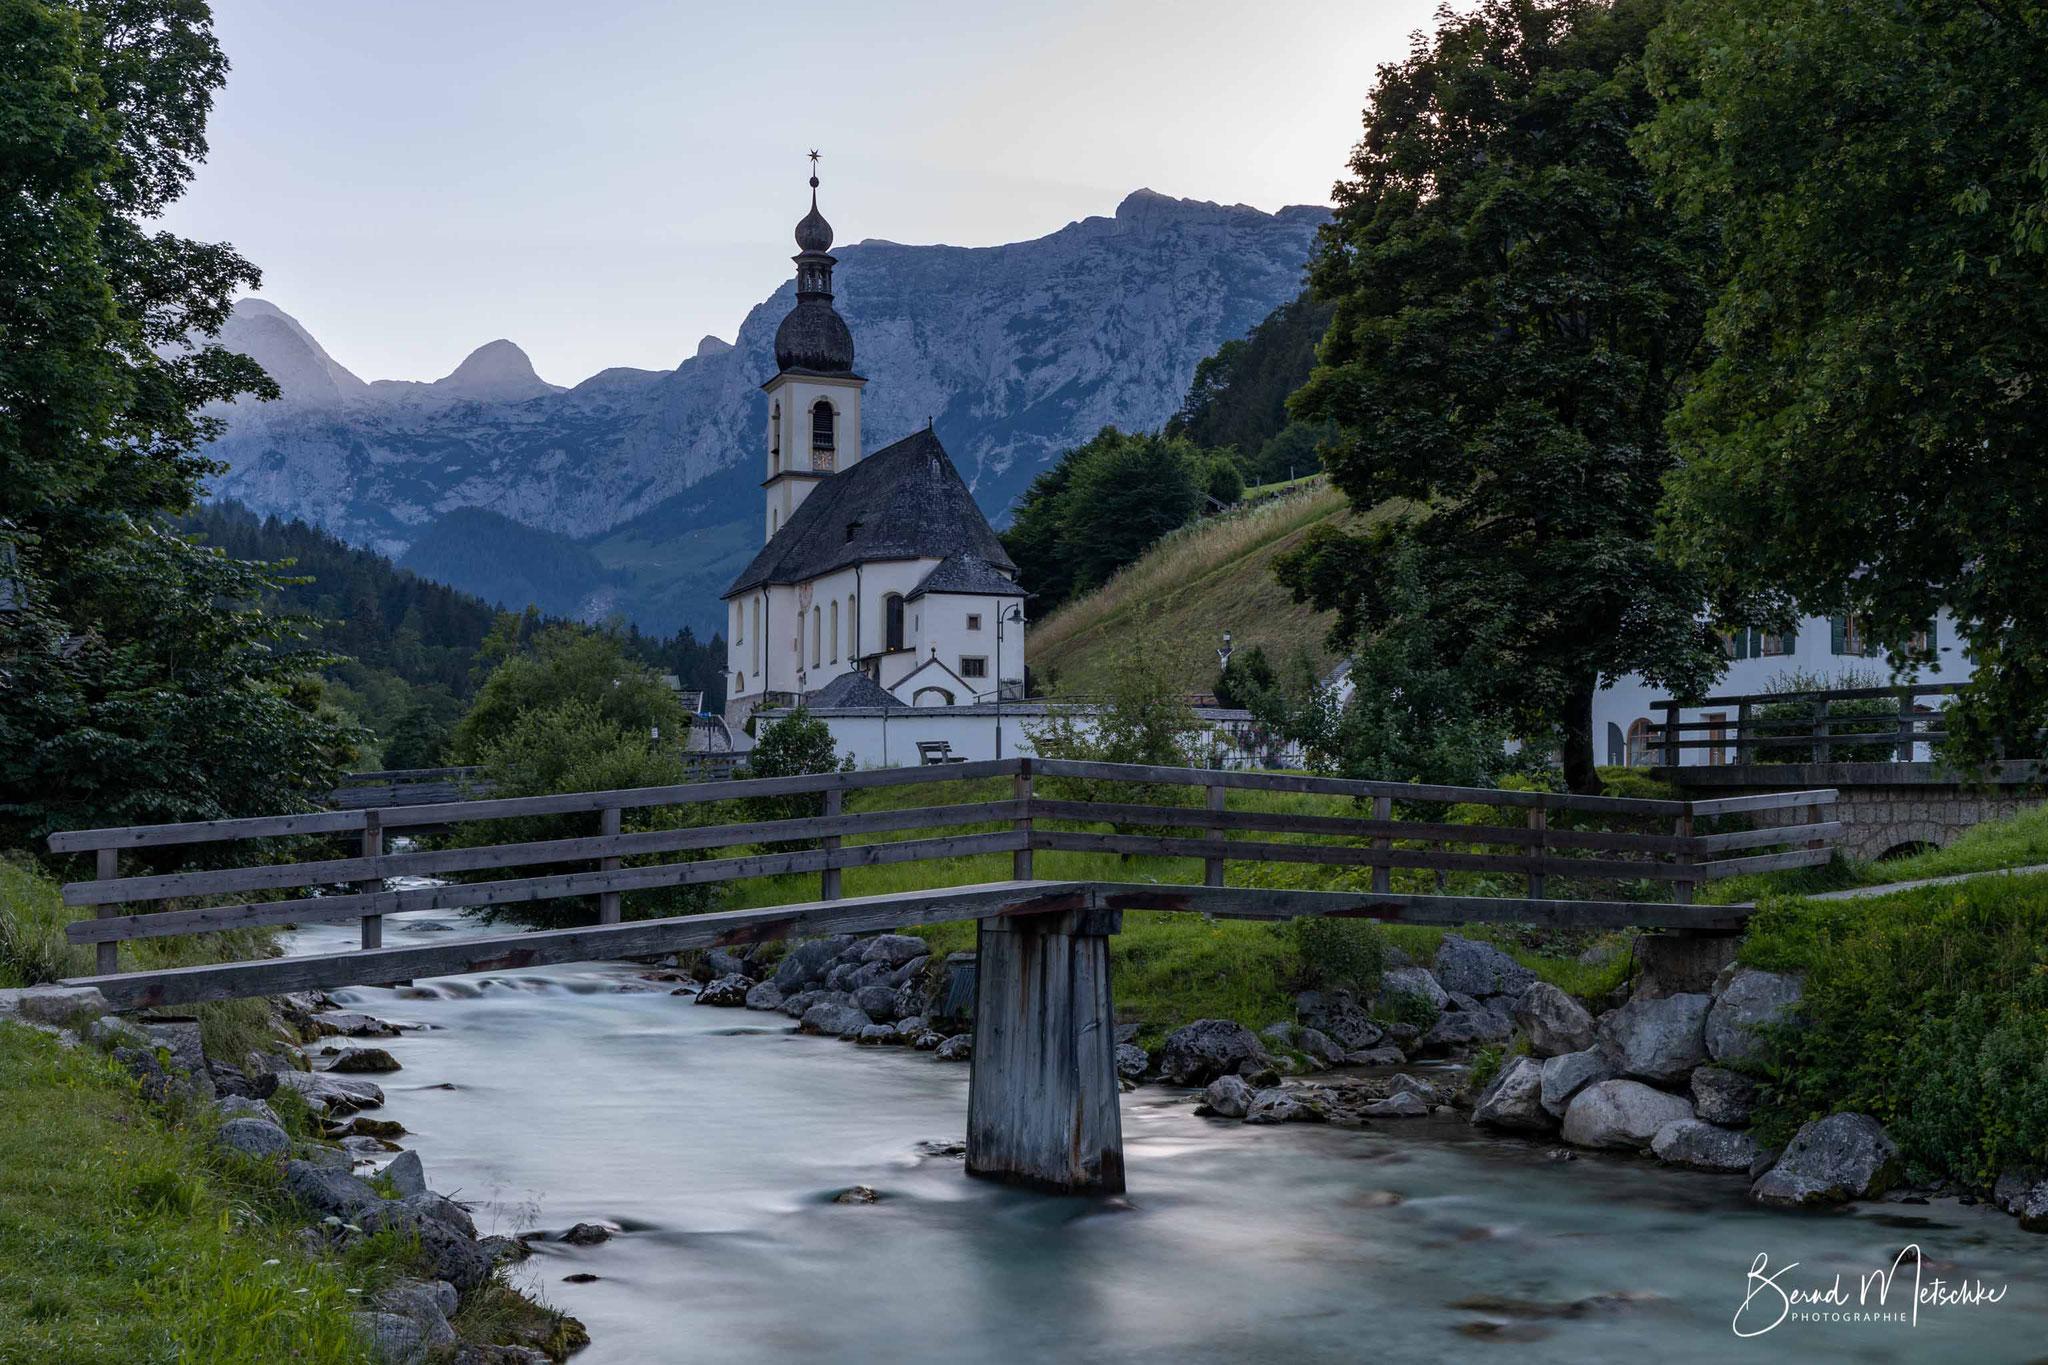 Pfarrkirche St. Sebastian in Ramsau